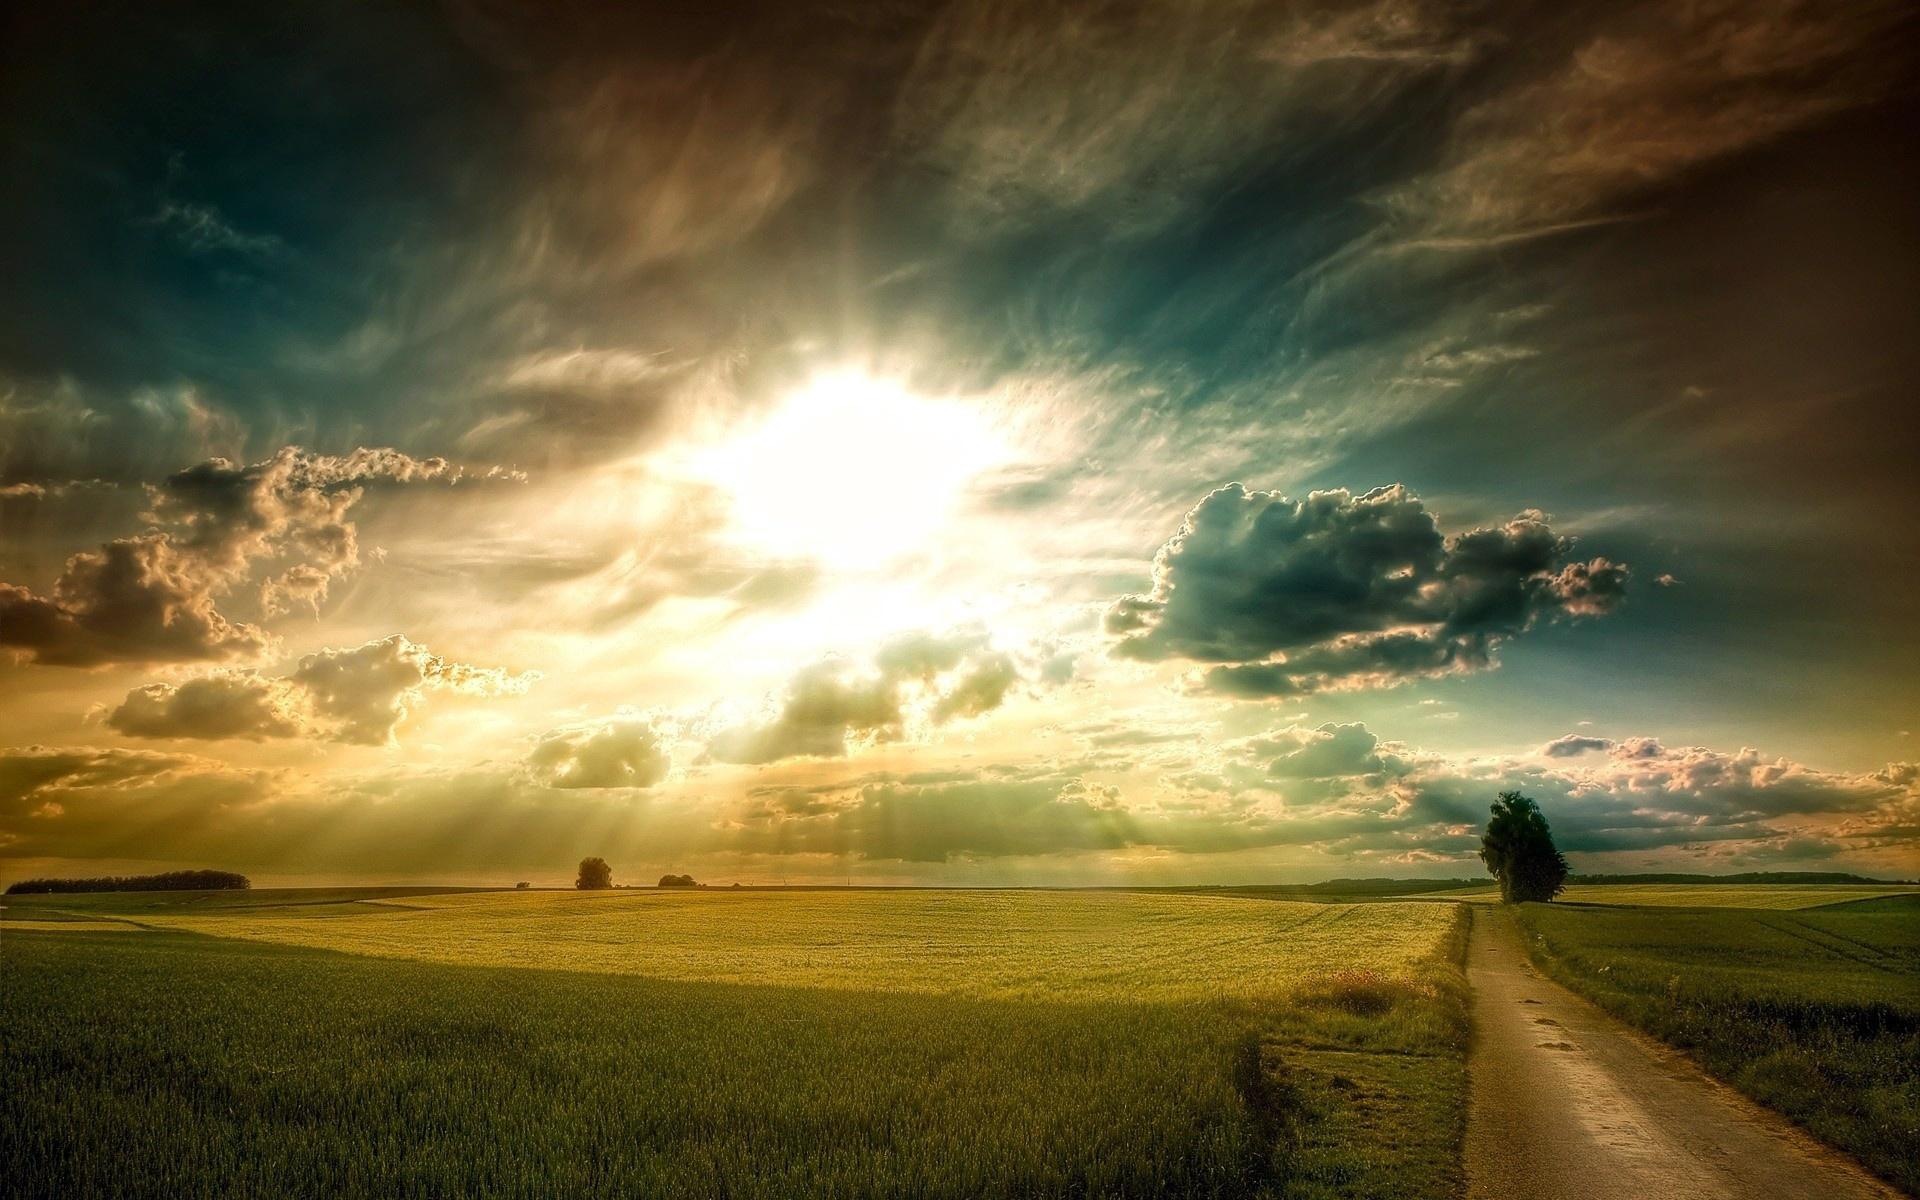 plains-landscape-grass-fields-road-tree-sky-clouds-sun-rays-1080p-wallpaper.jpg